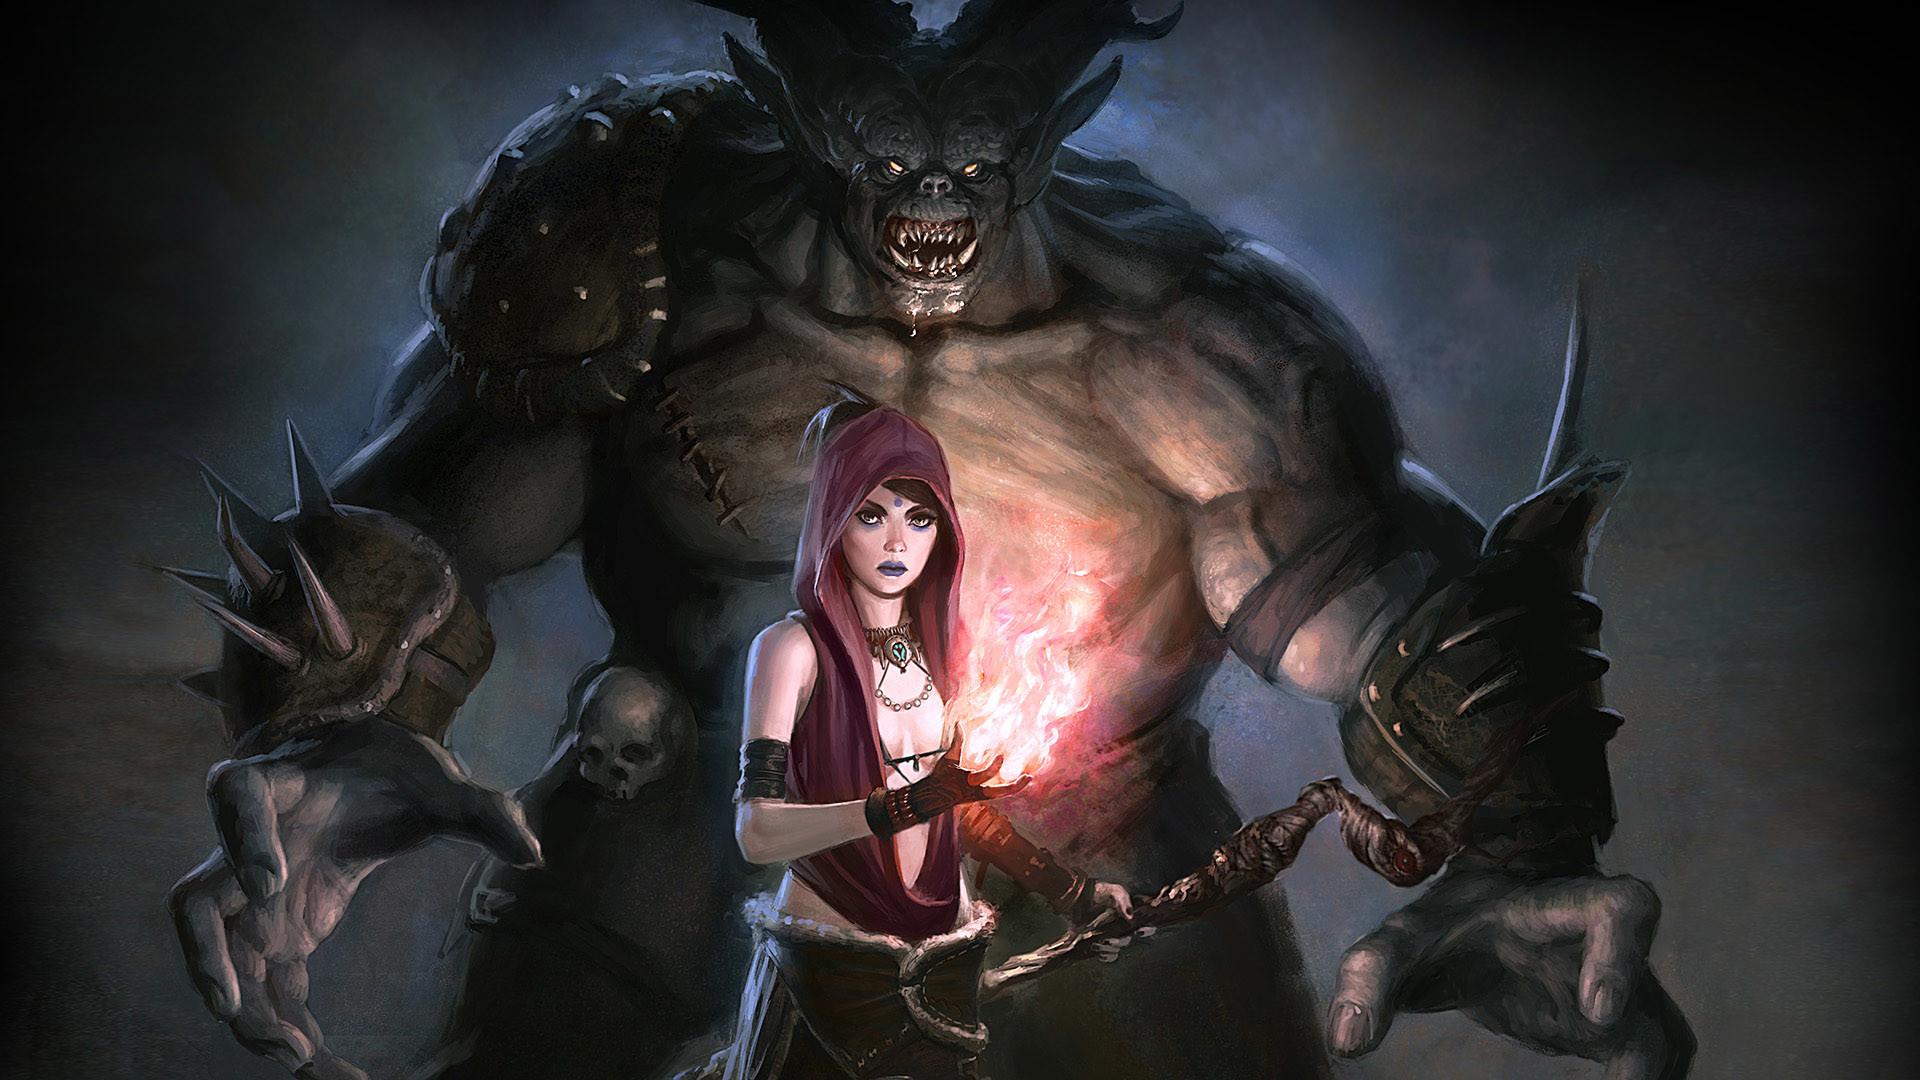 Res: 1920x1080, Computerspiele - Dragon Age: Origins Hexe Dämon Sorceress Fantasy Wallpaper